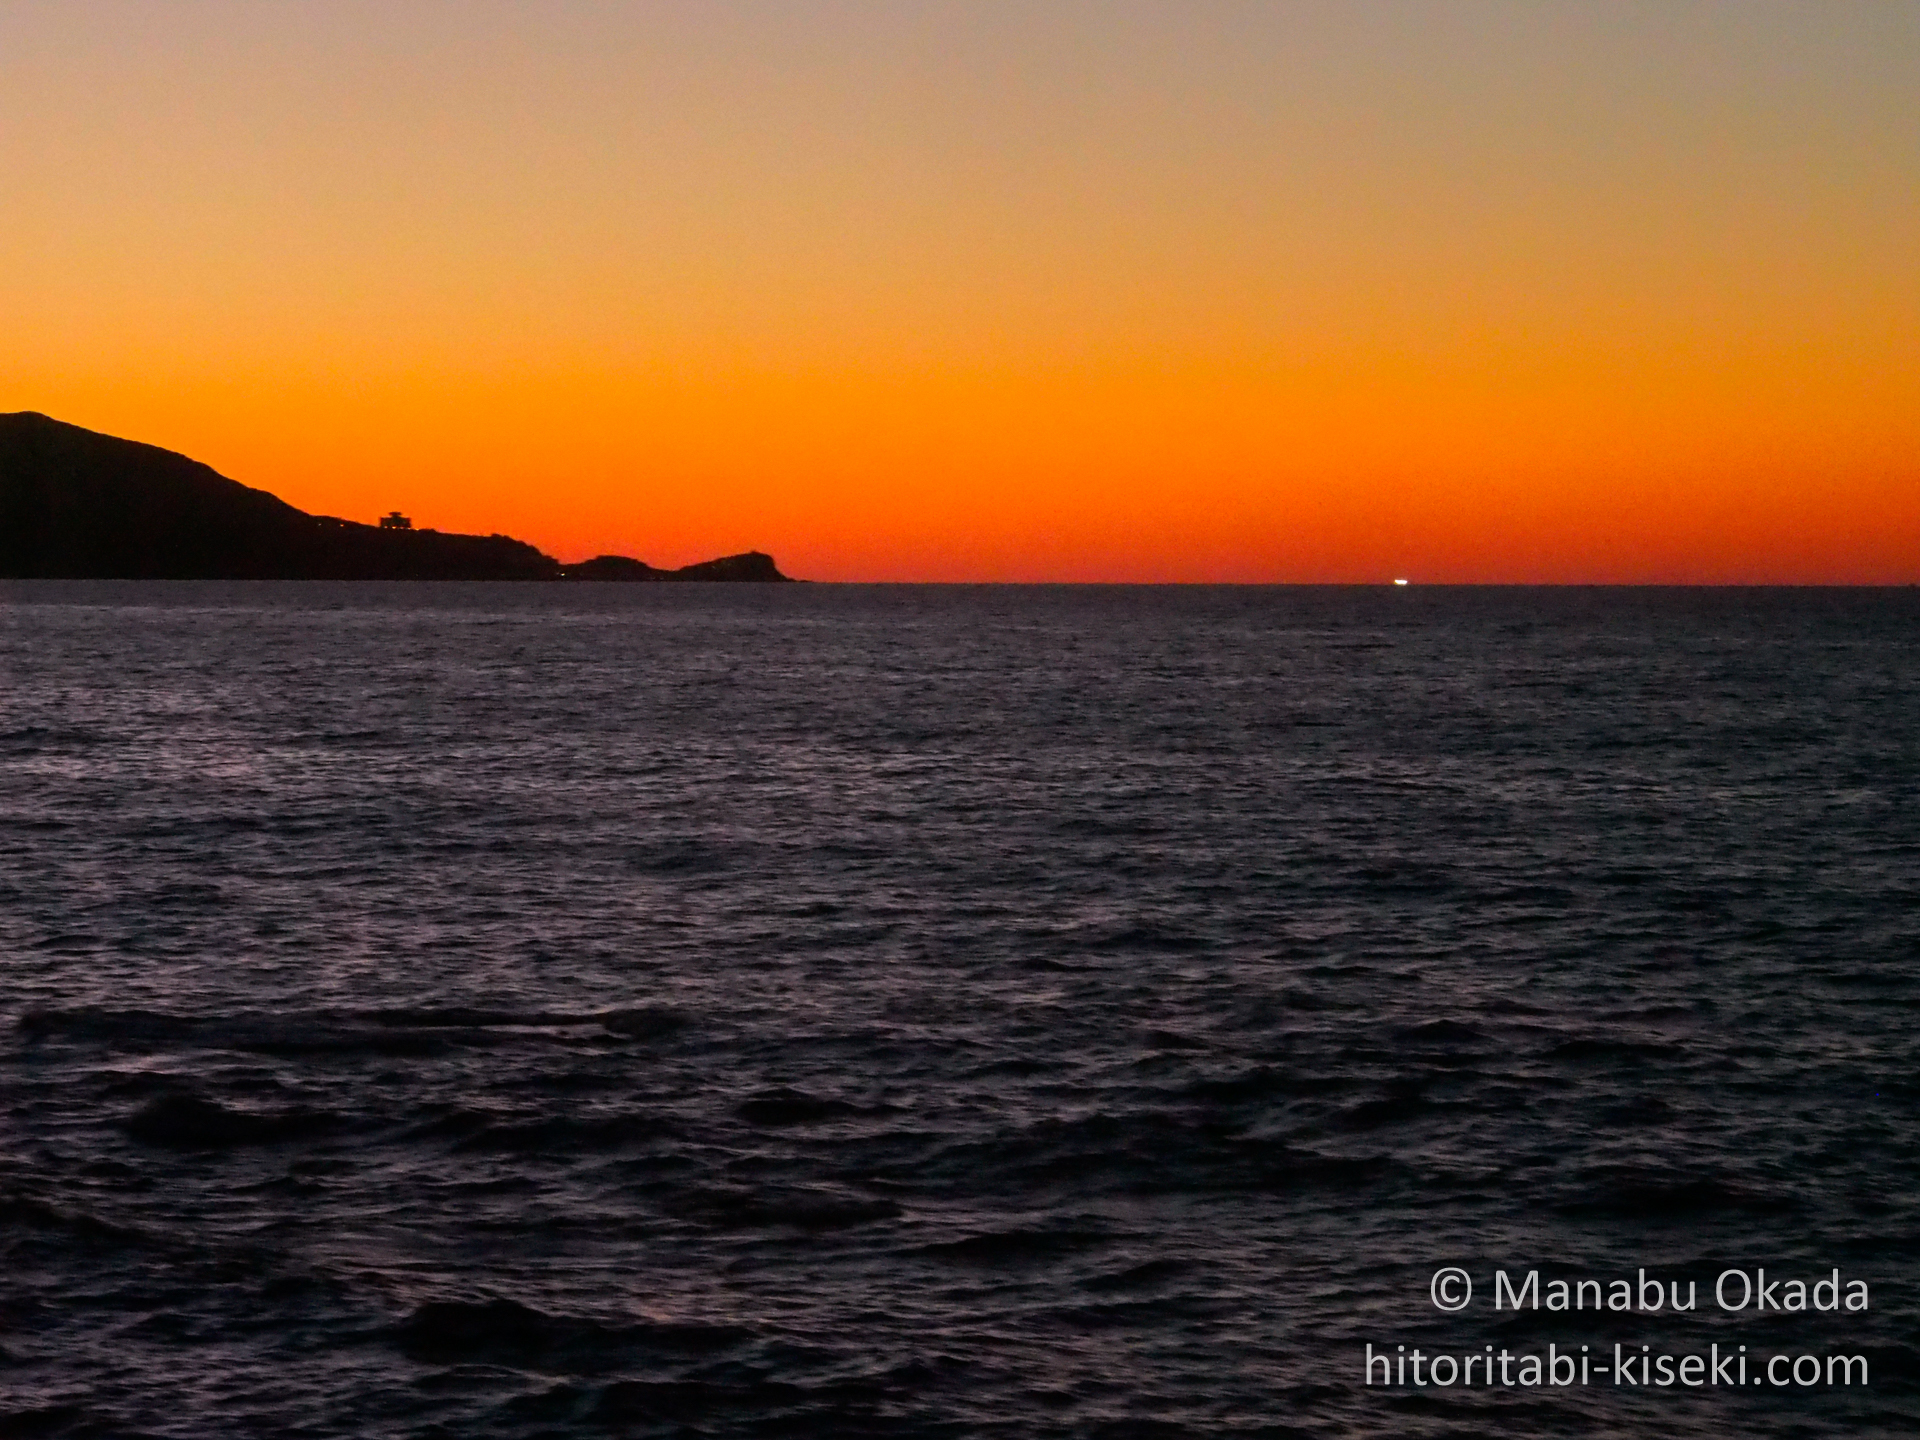 sunset-sea.jpg